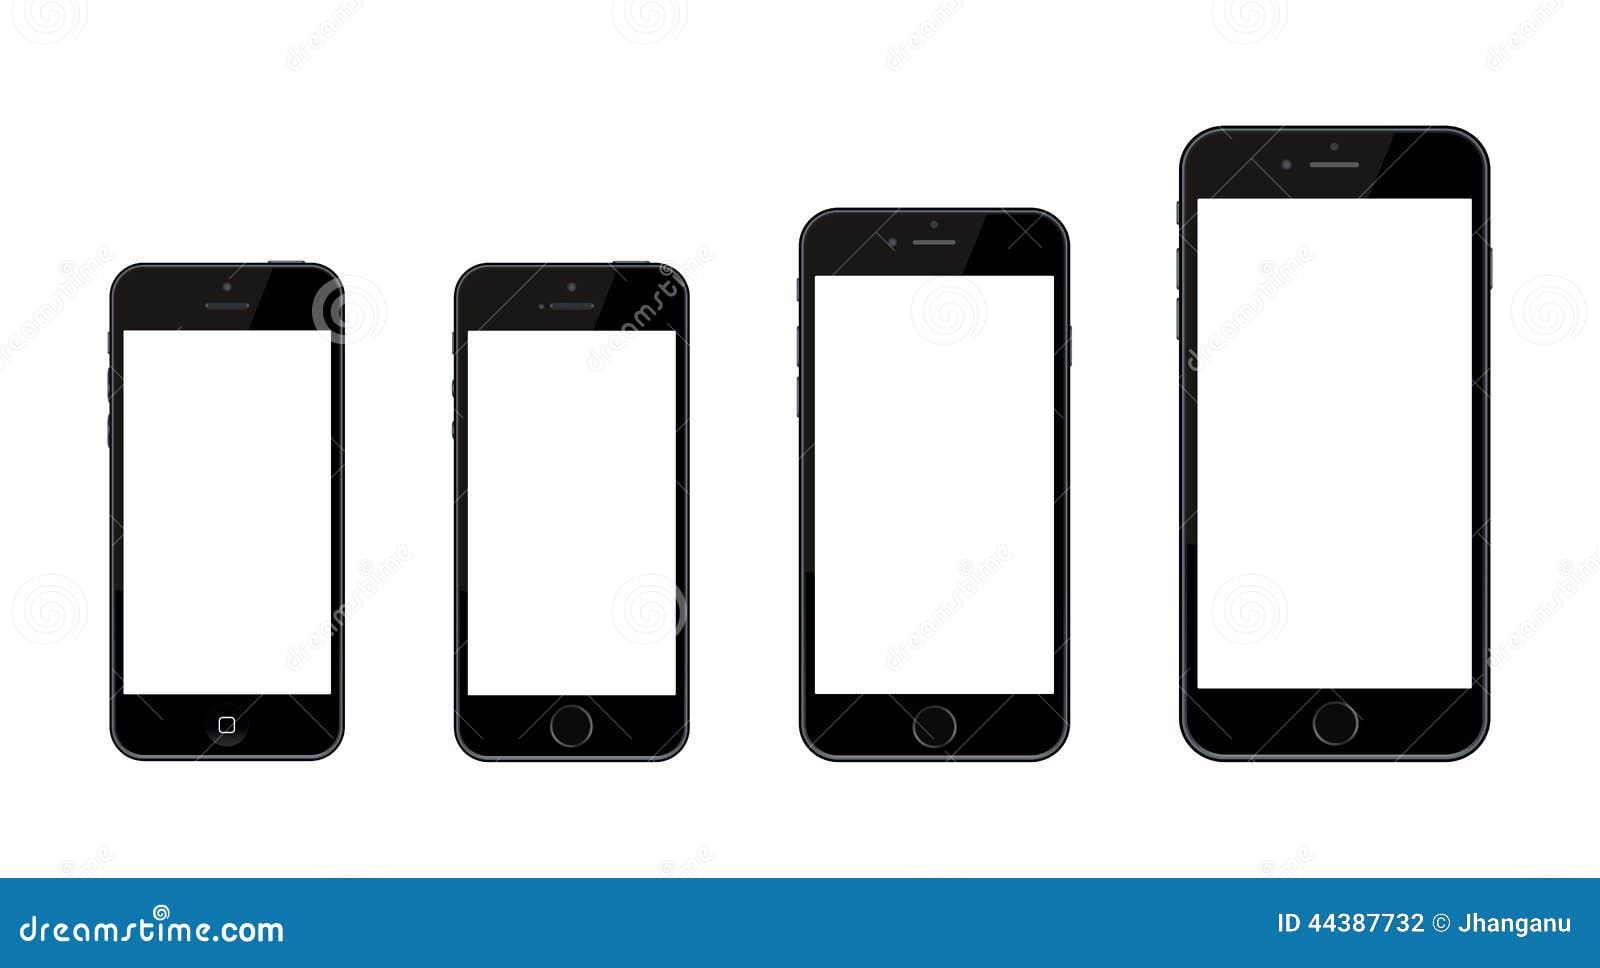 Nieuwe Apple-iPhone 6 en iPhone 6 plus en iPhone 5